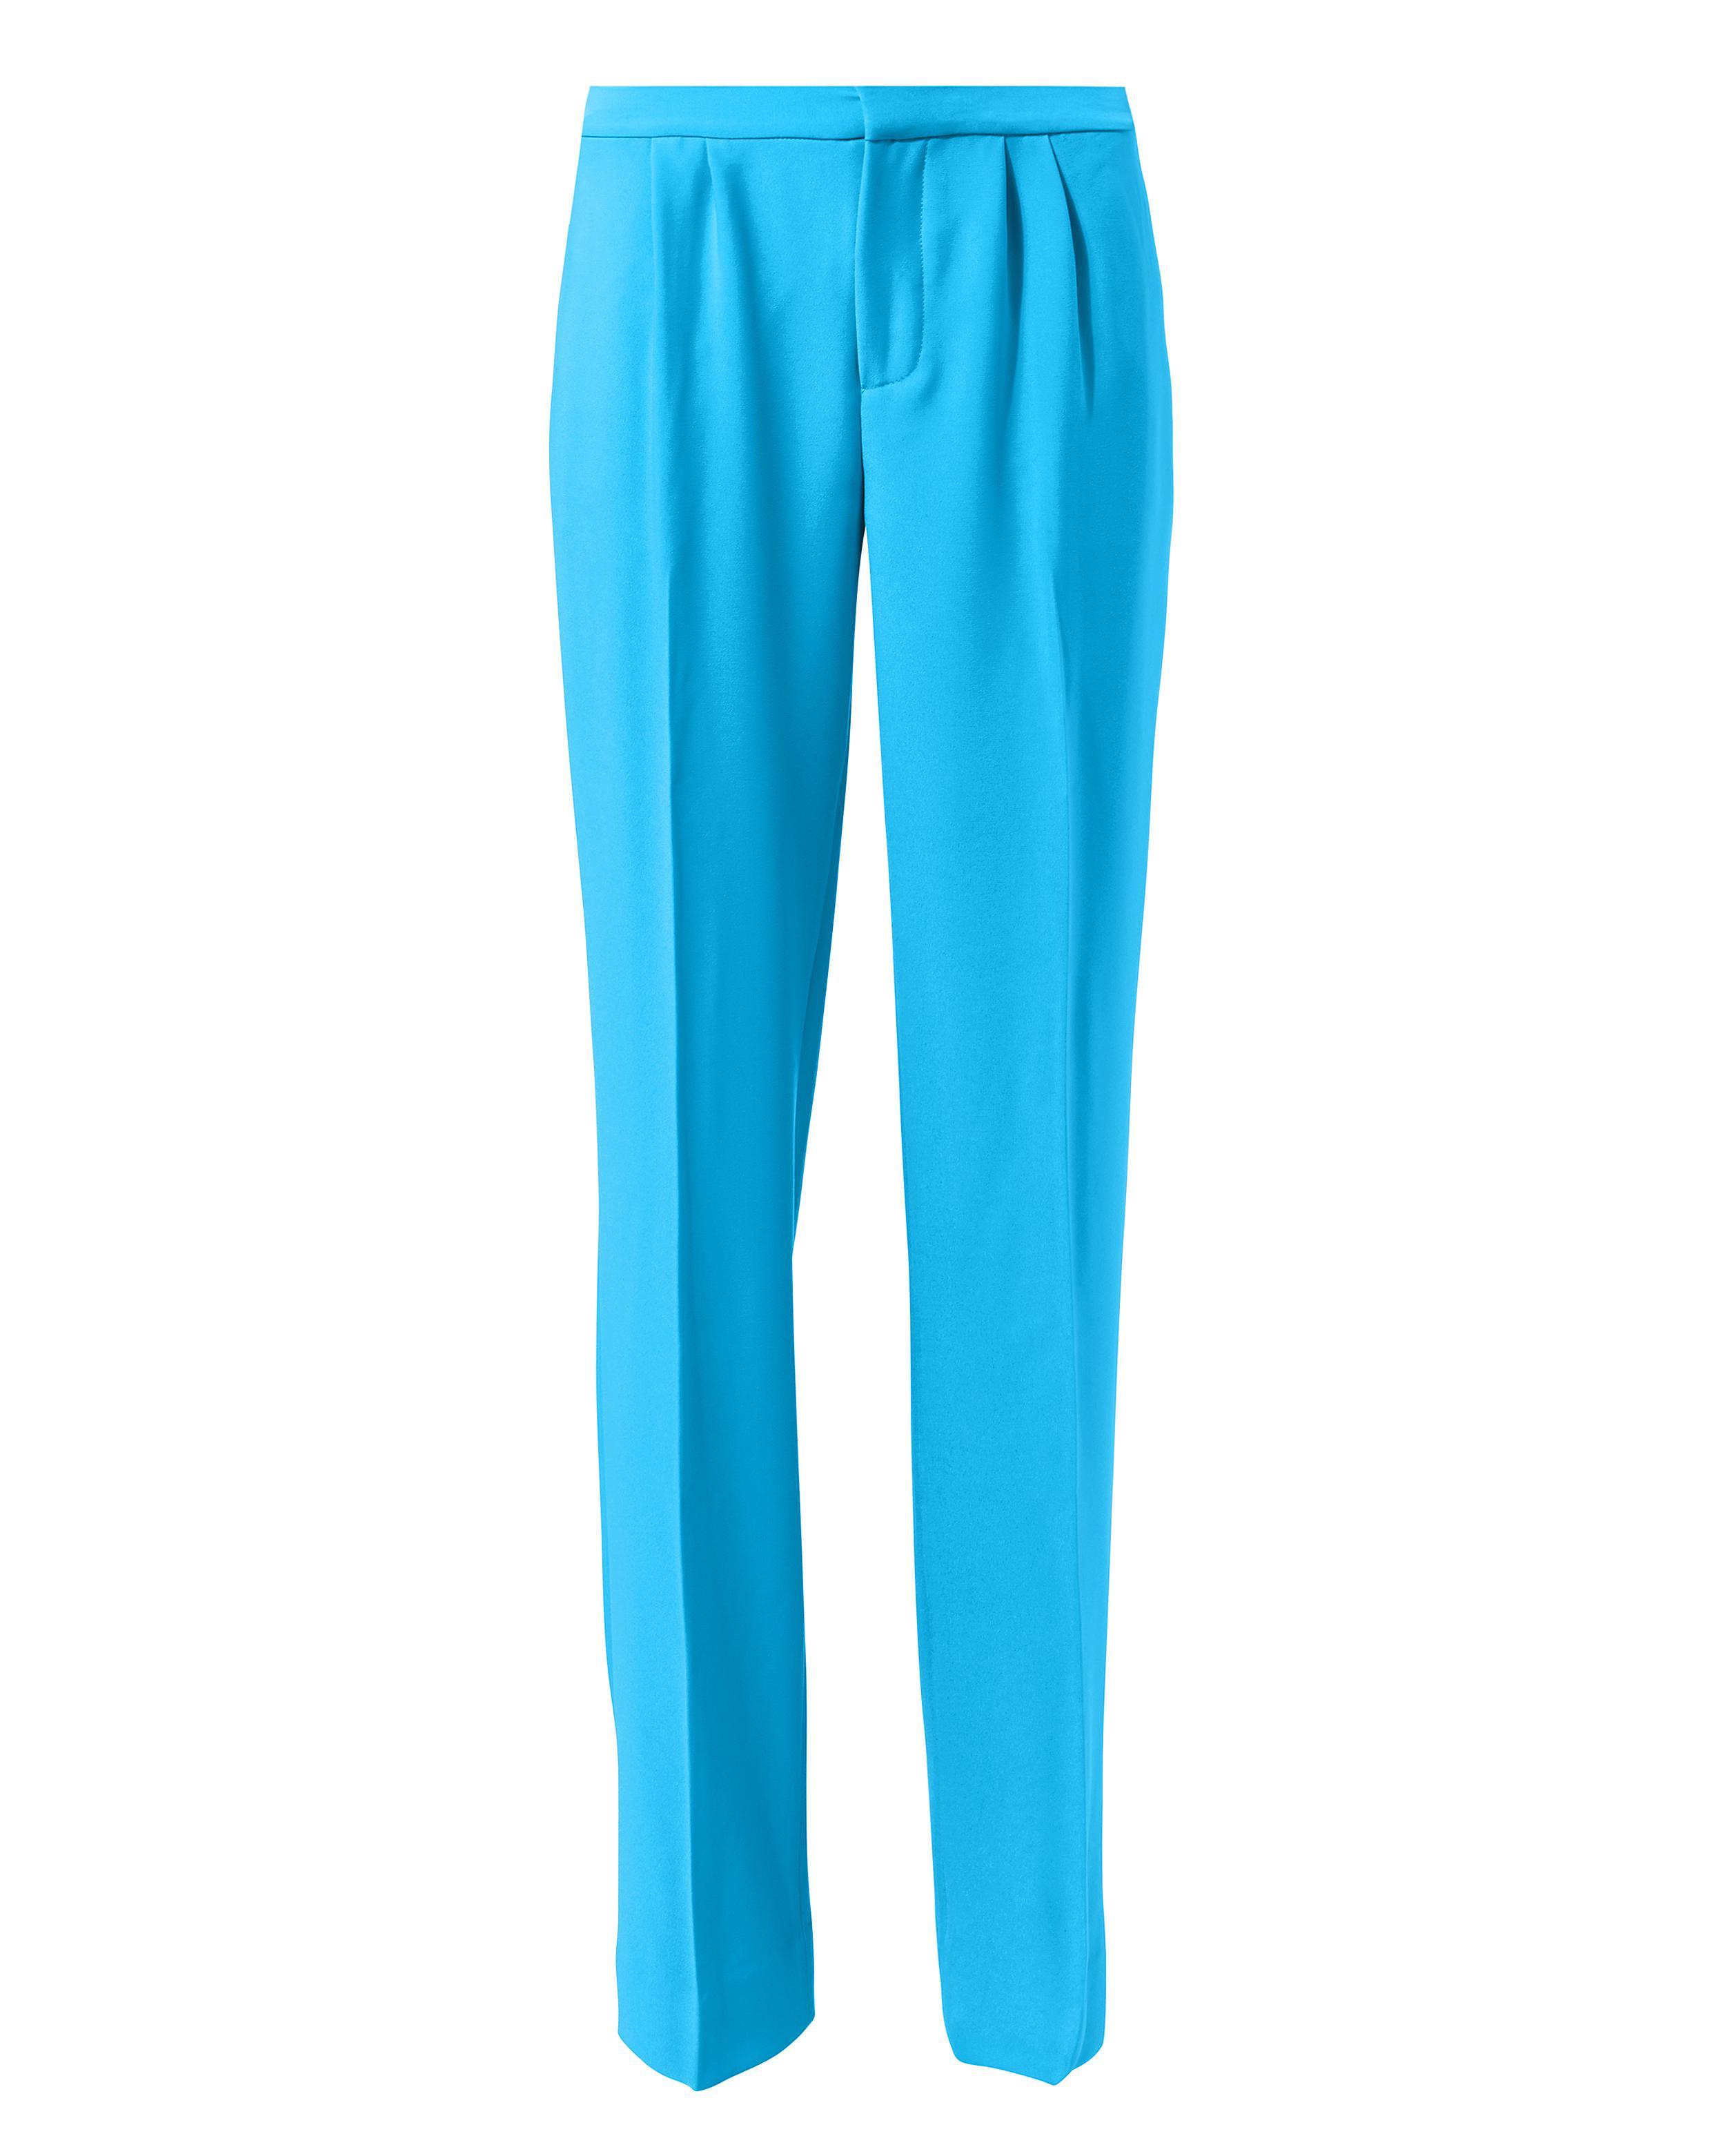 Lyst Frame Malibu Blue Trousers in Blue